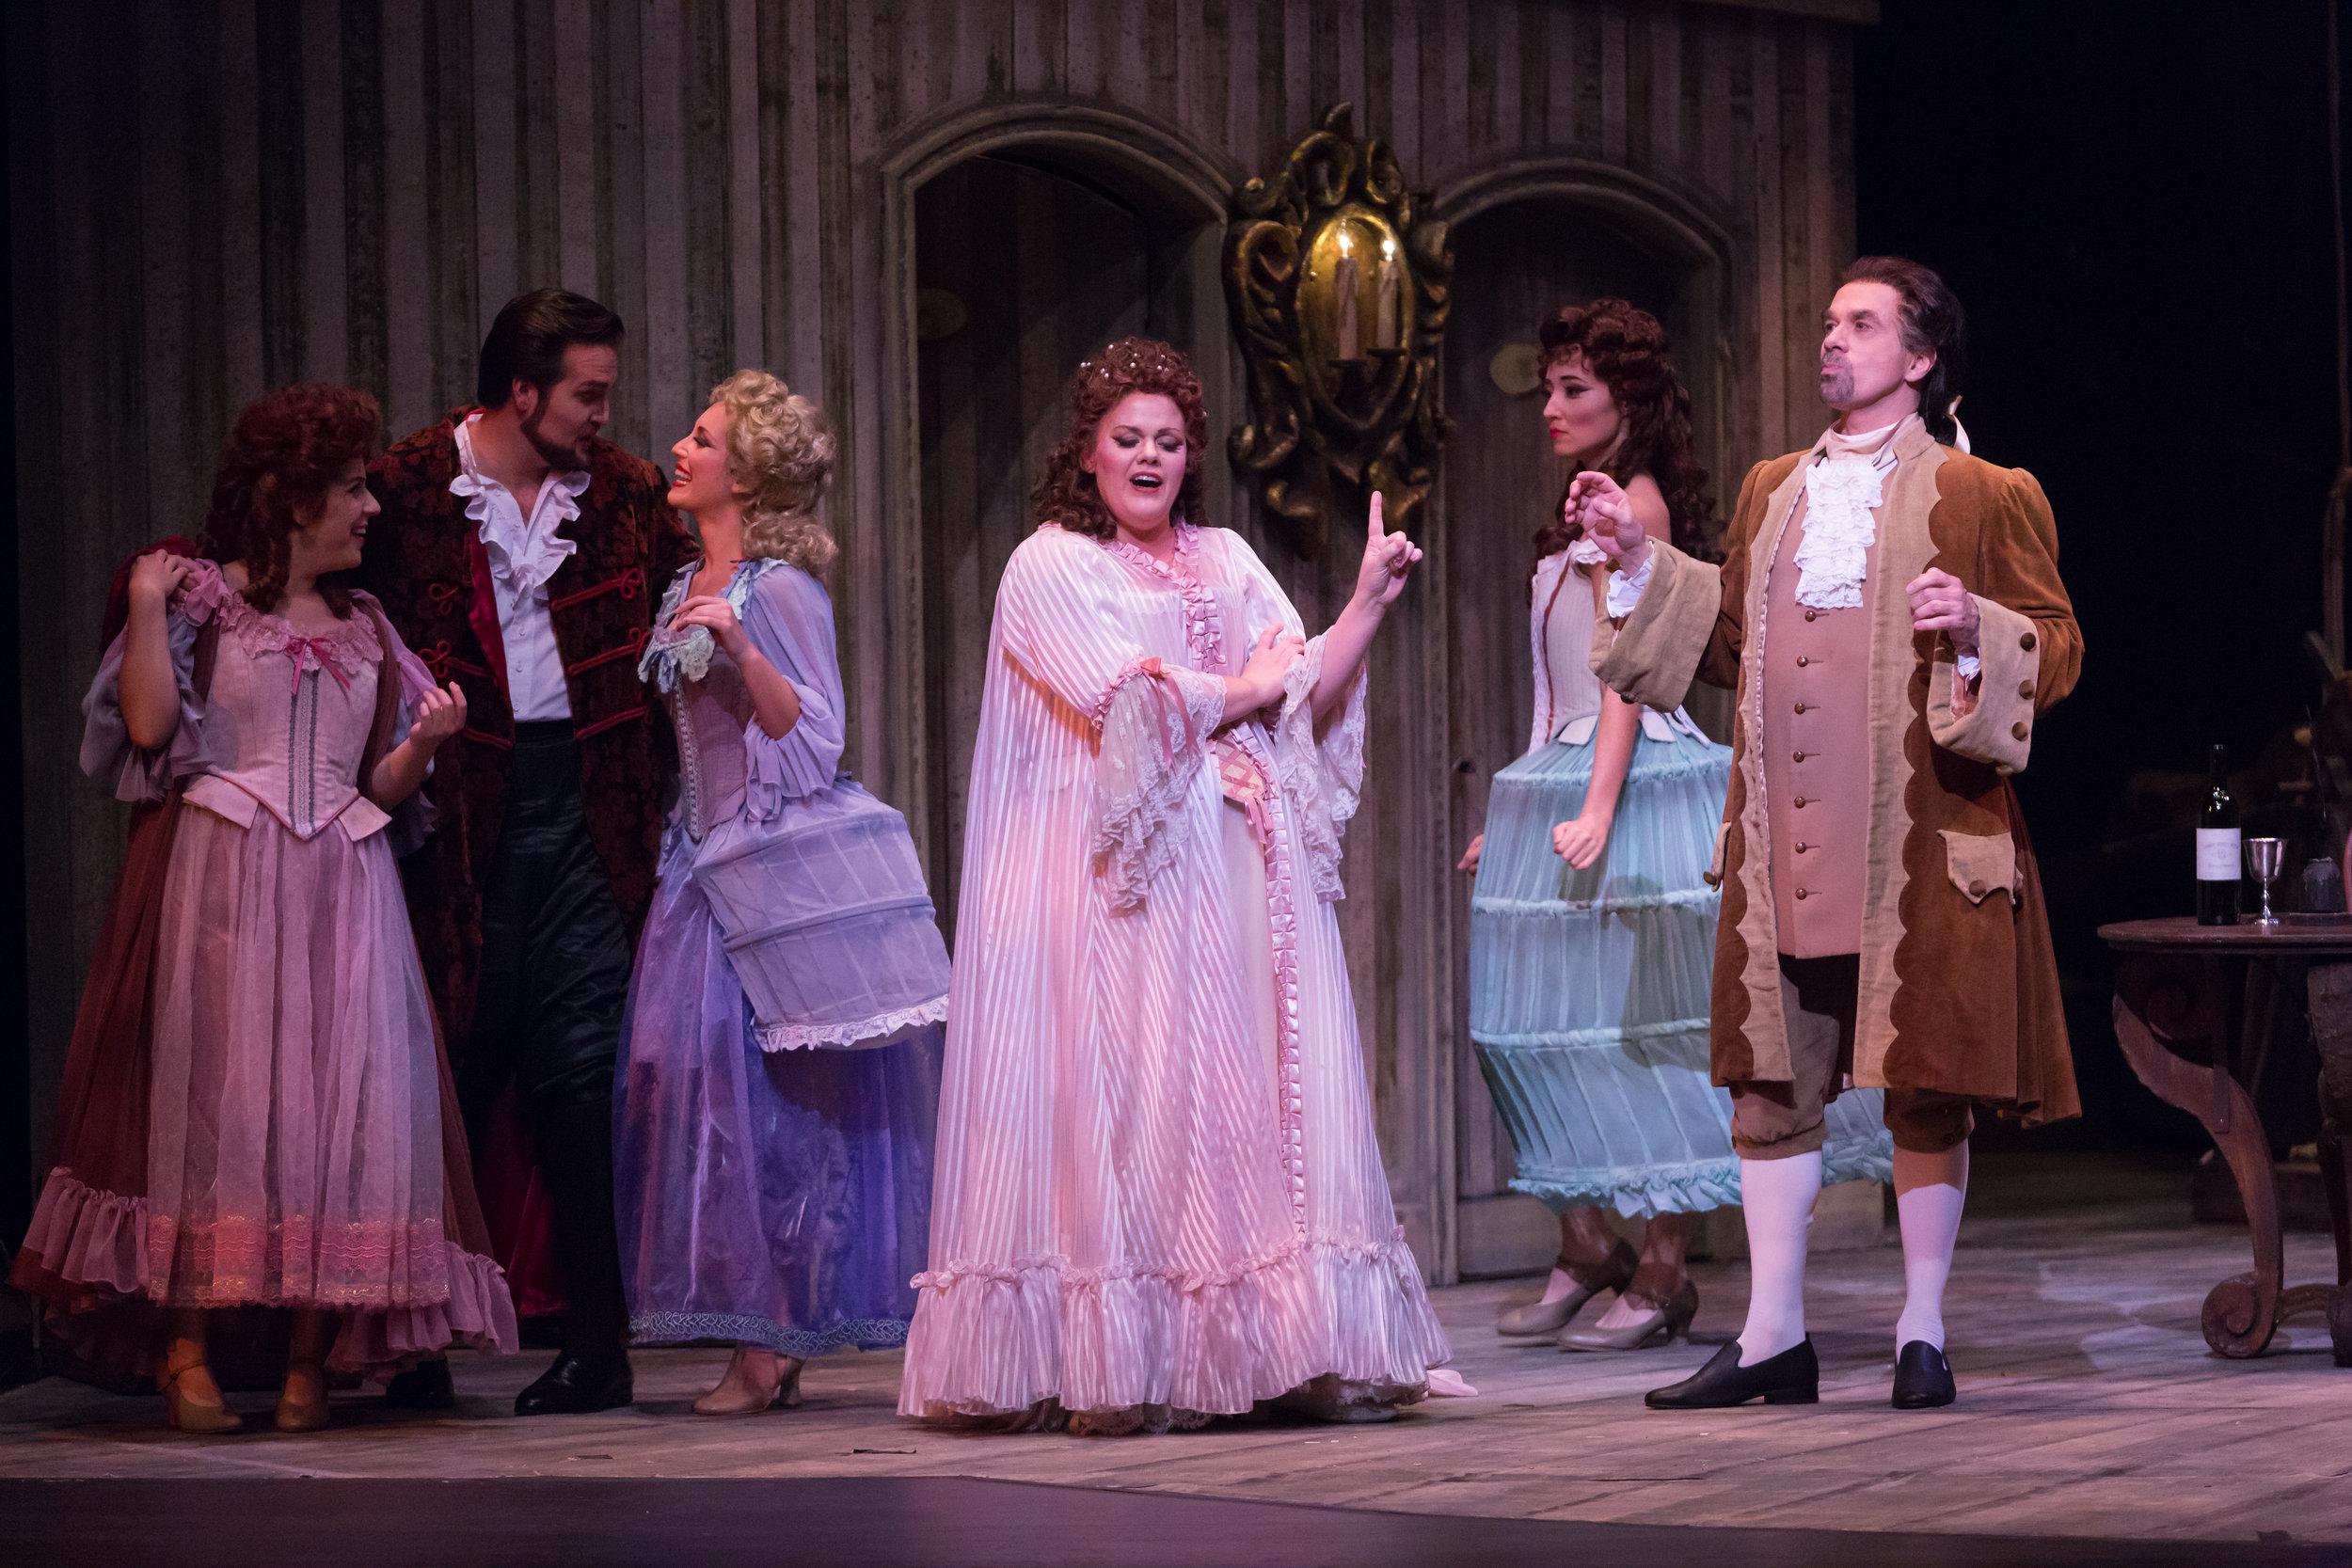 Photo credit: Palm Beach Opera  Echo in Ariadne auf Naxos   With Jessica Fishenfeld, Fleur Barron, Wendy Bryn Harmer, Brian Jagde, and Mark Schnaible